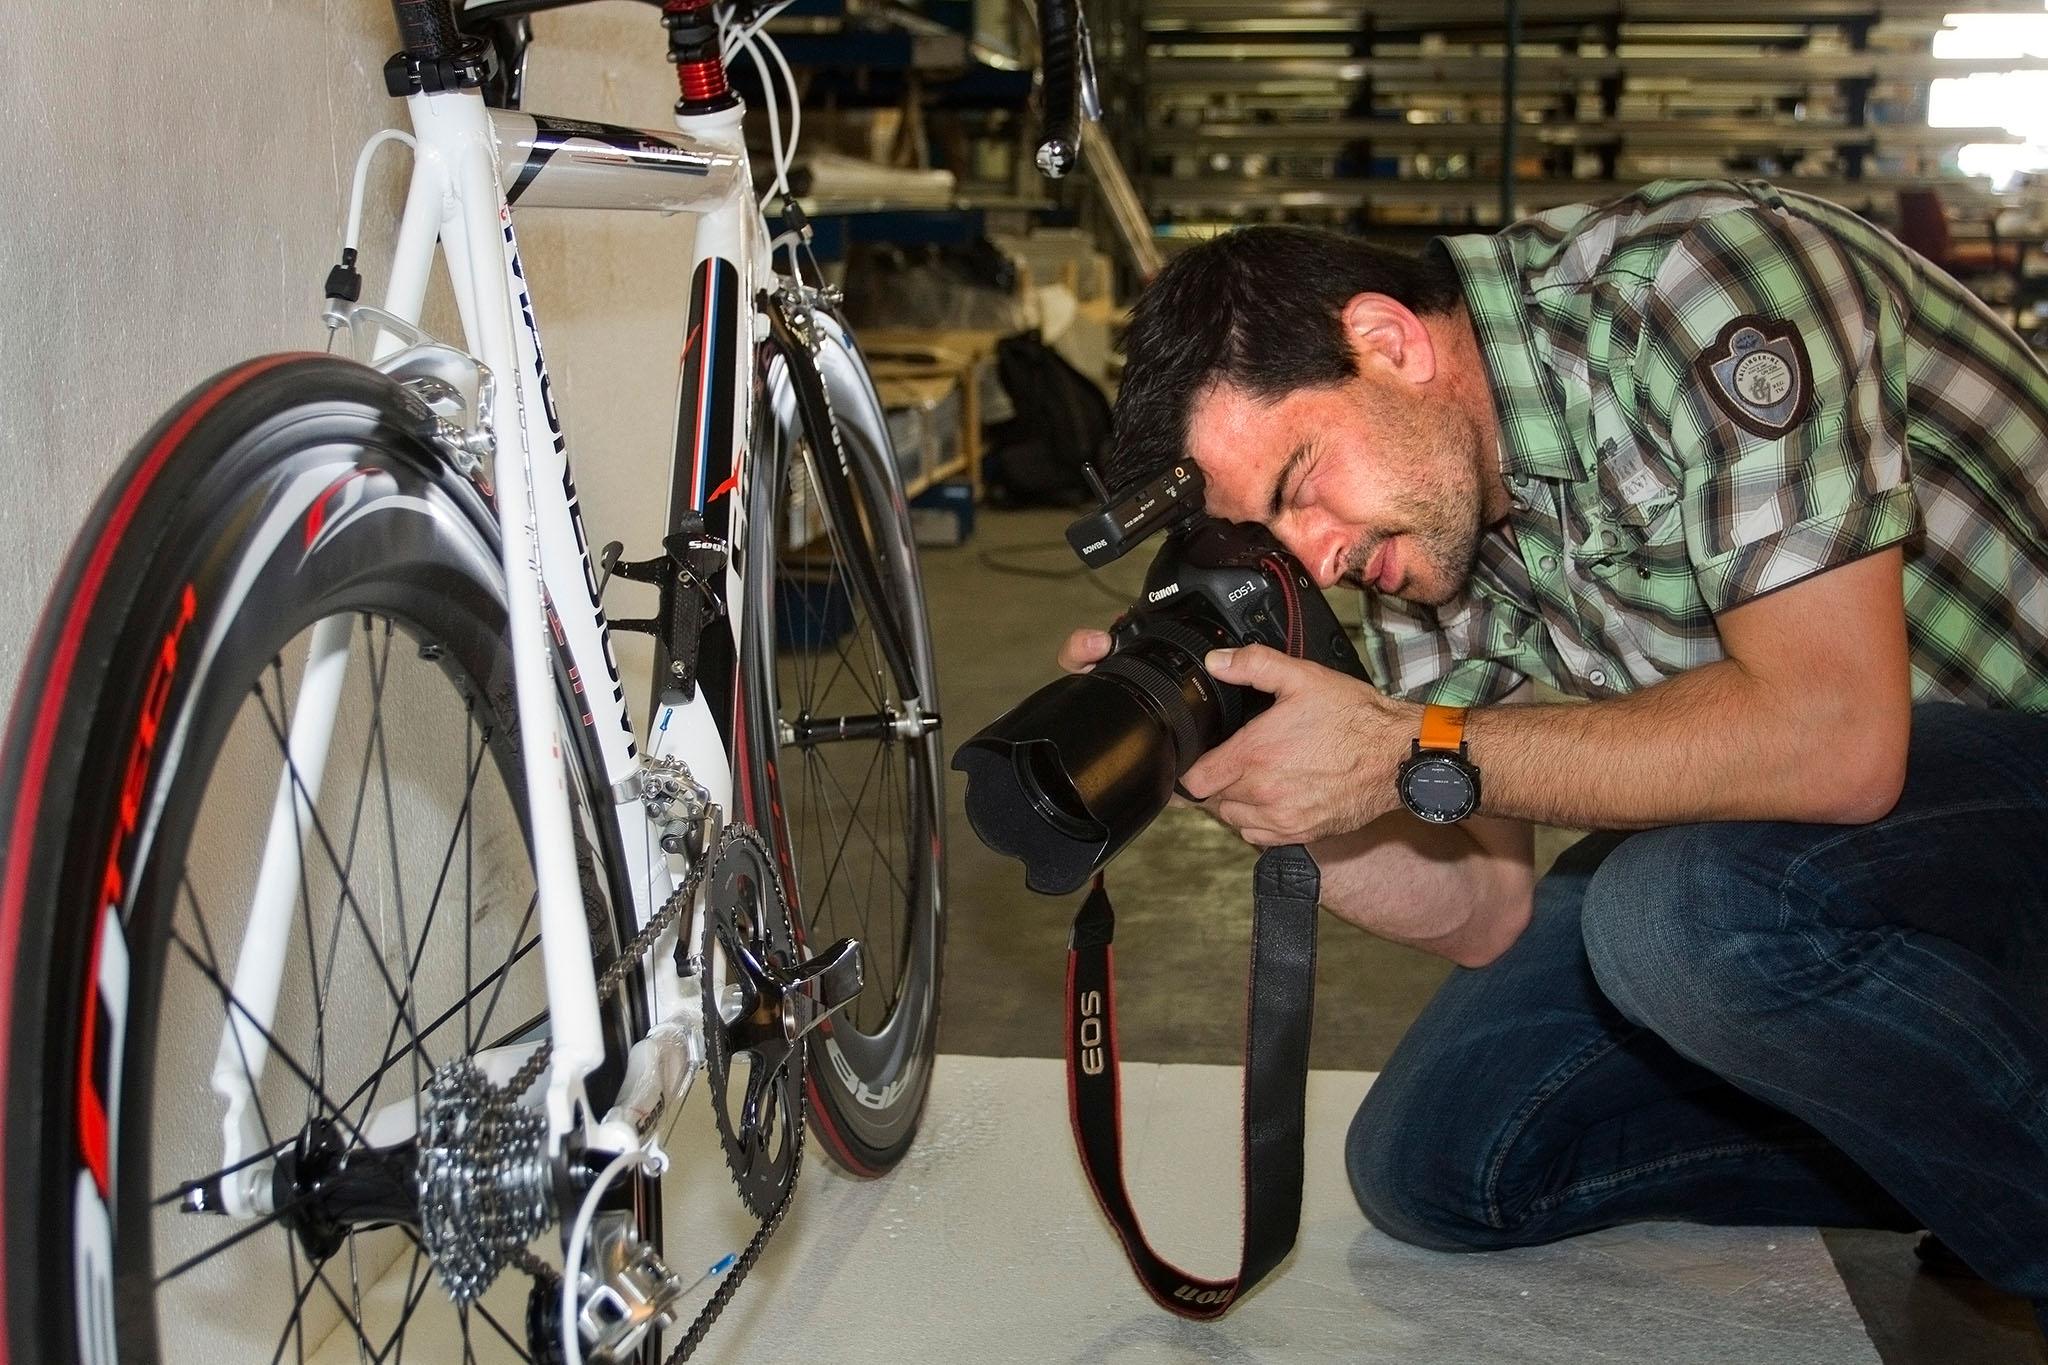 Ondernemerscafé Patrick van Gemert aan het werk voor Segal bikes FOTO ARJAN GOTINK